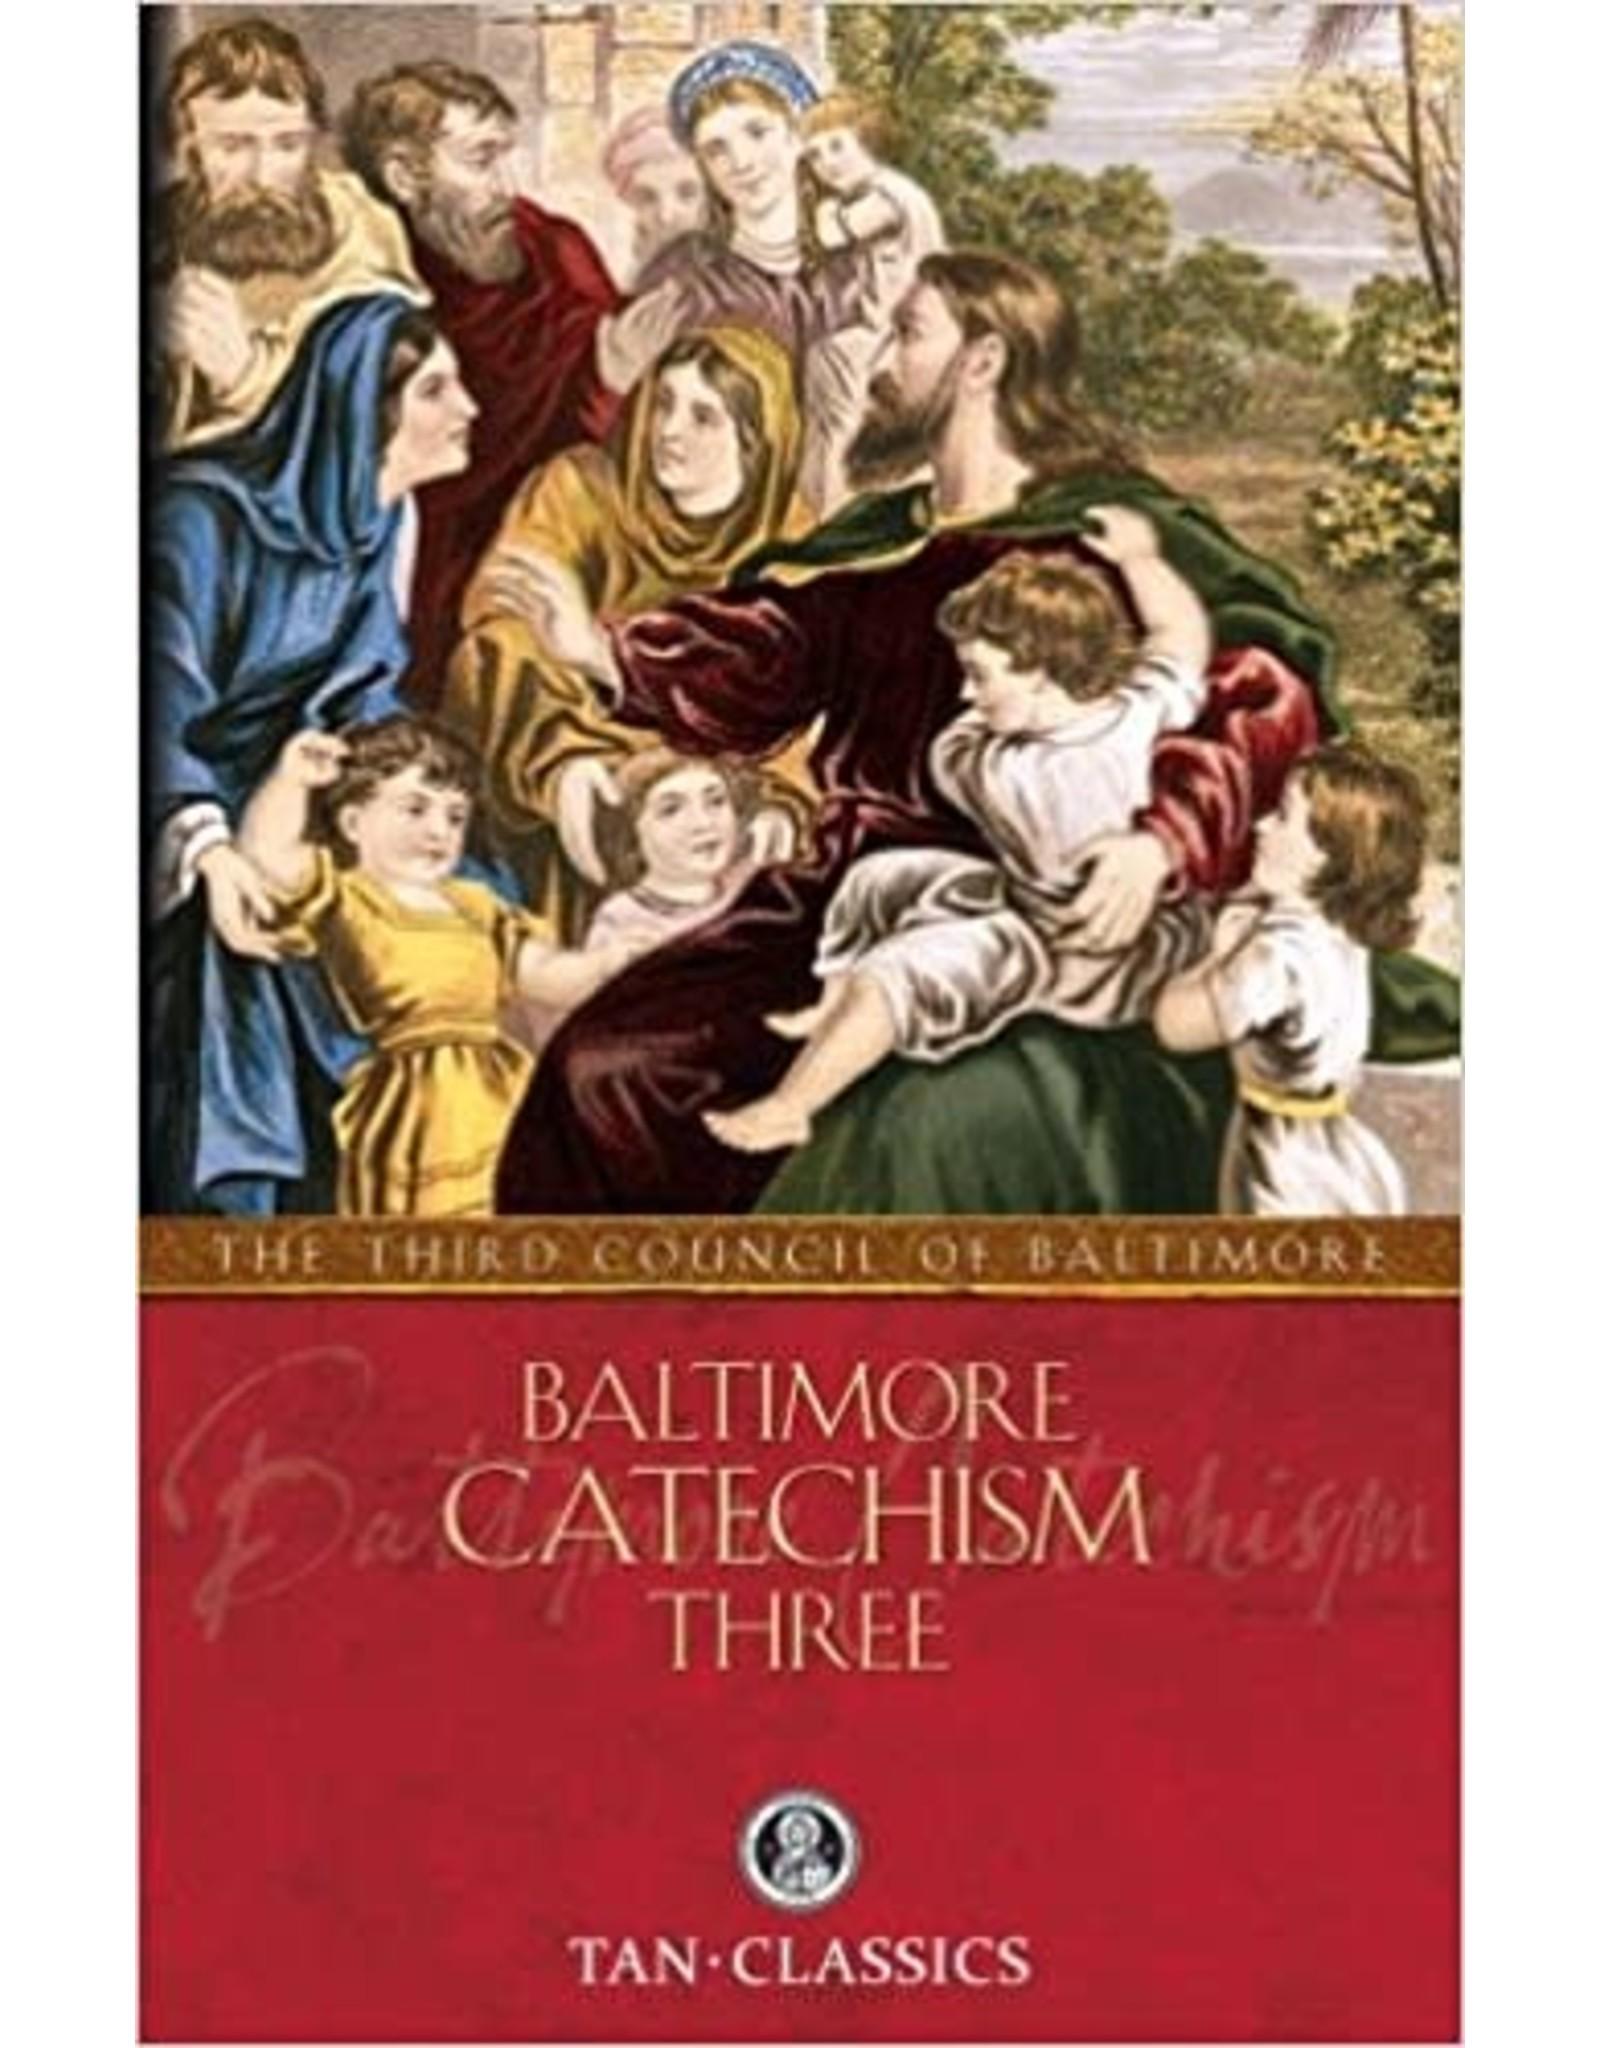 Tan Books Baltimore Catechism Three (with Supplemental Reading: Catholic Prayers) by Rev Thomas Kinkead (Paperback)